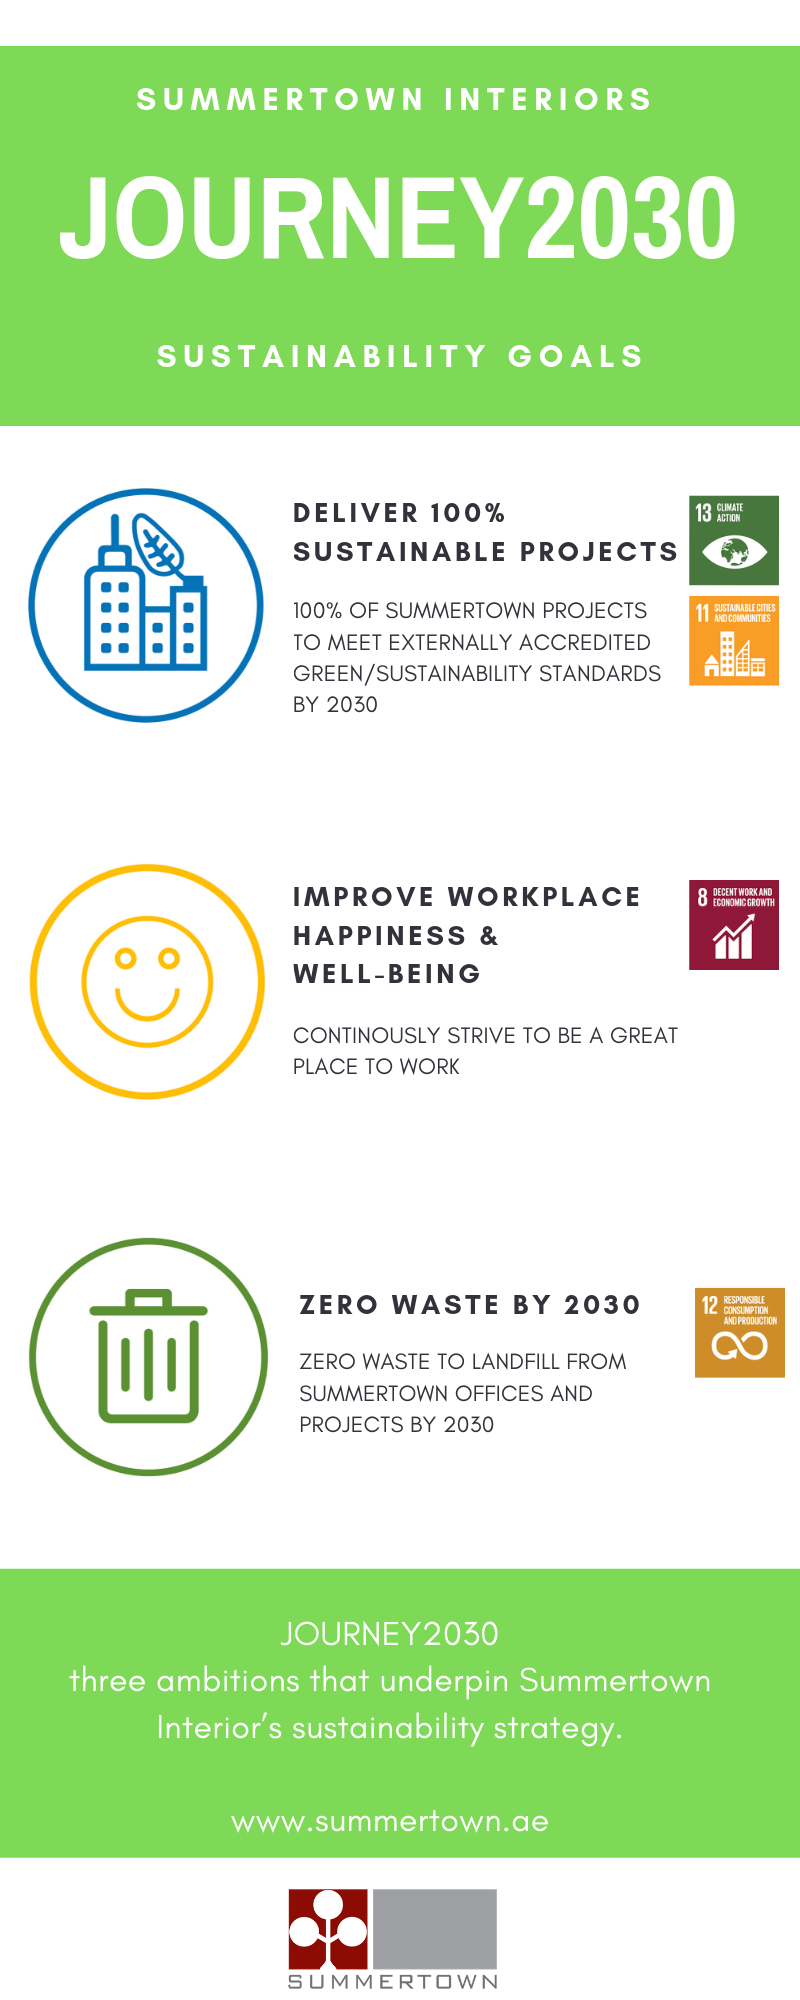 Summertown Sustainability Goals Infographic